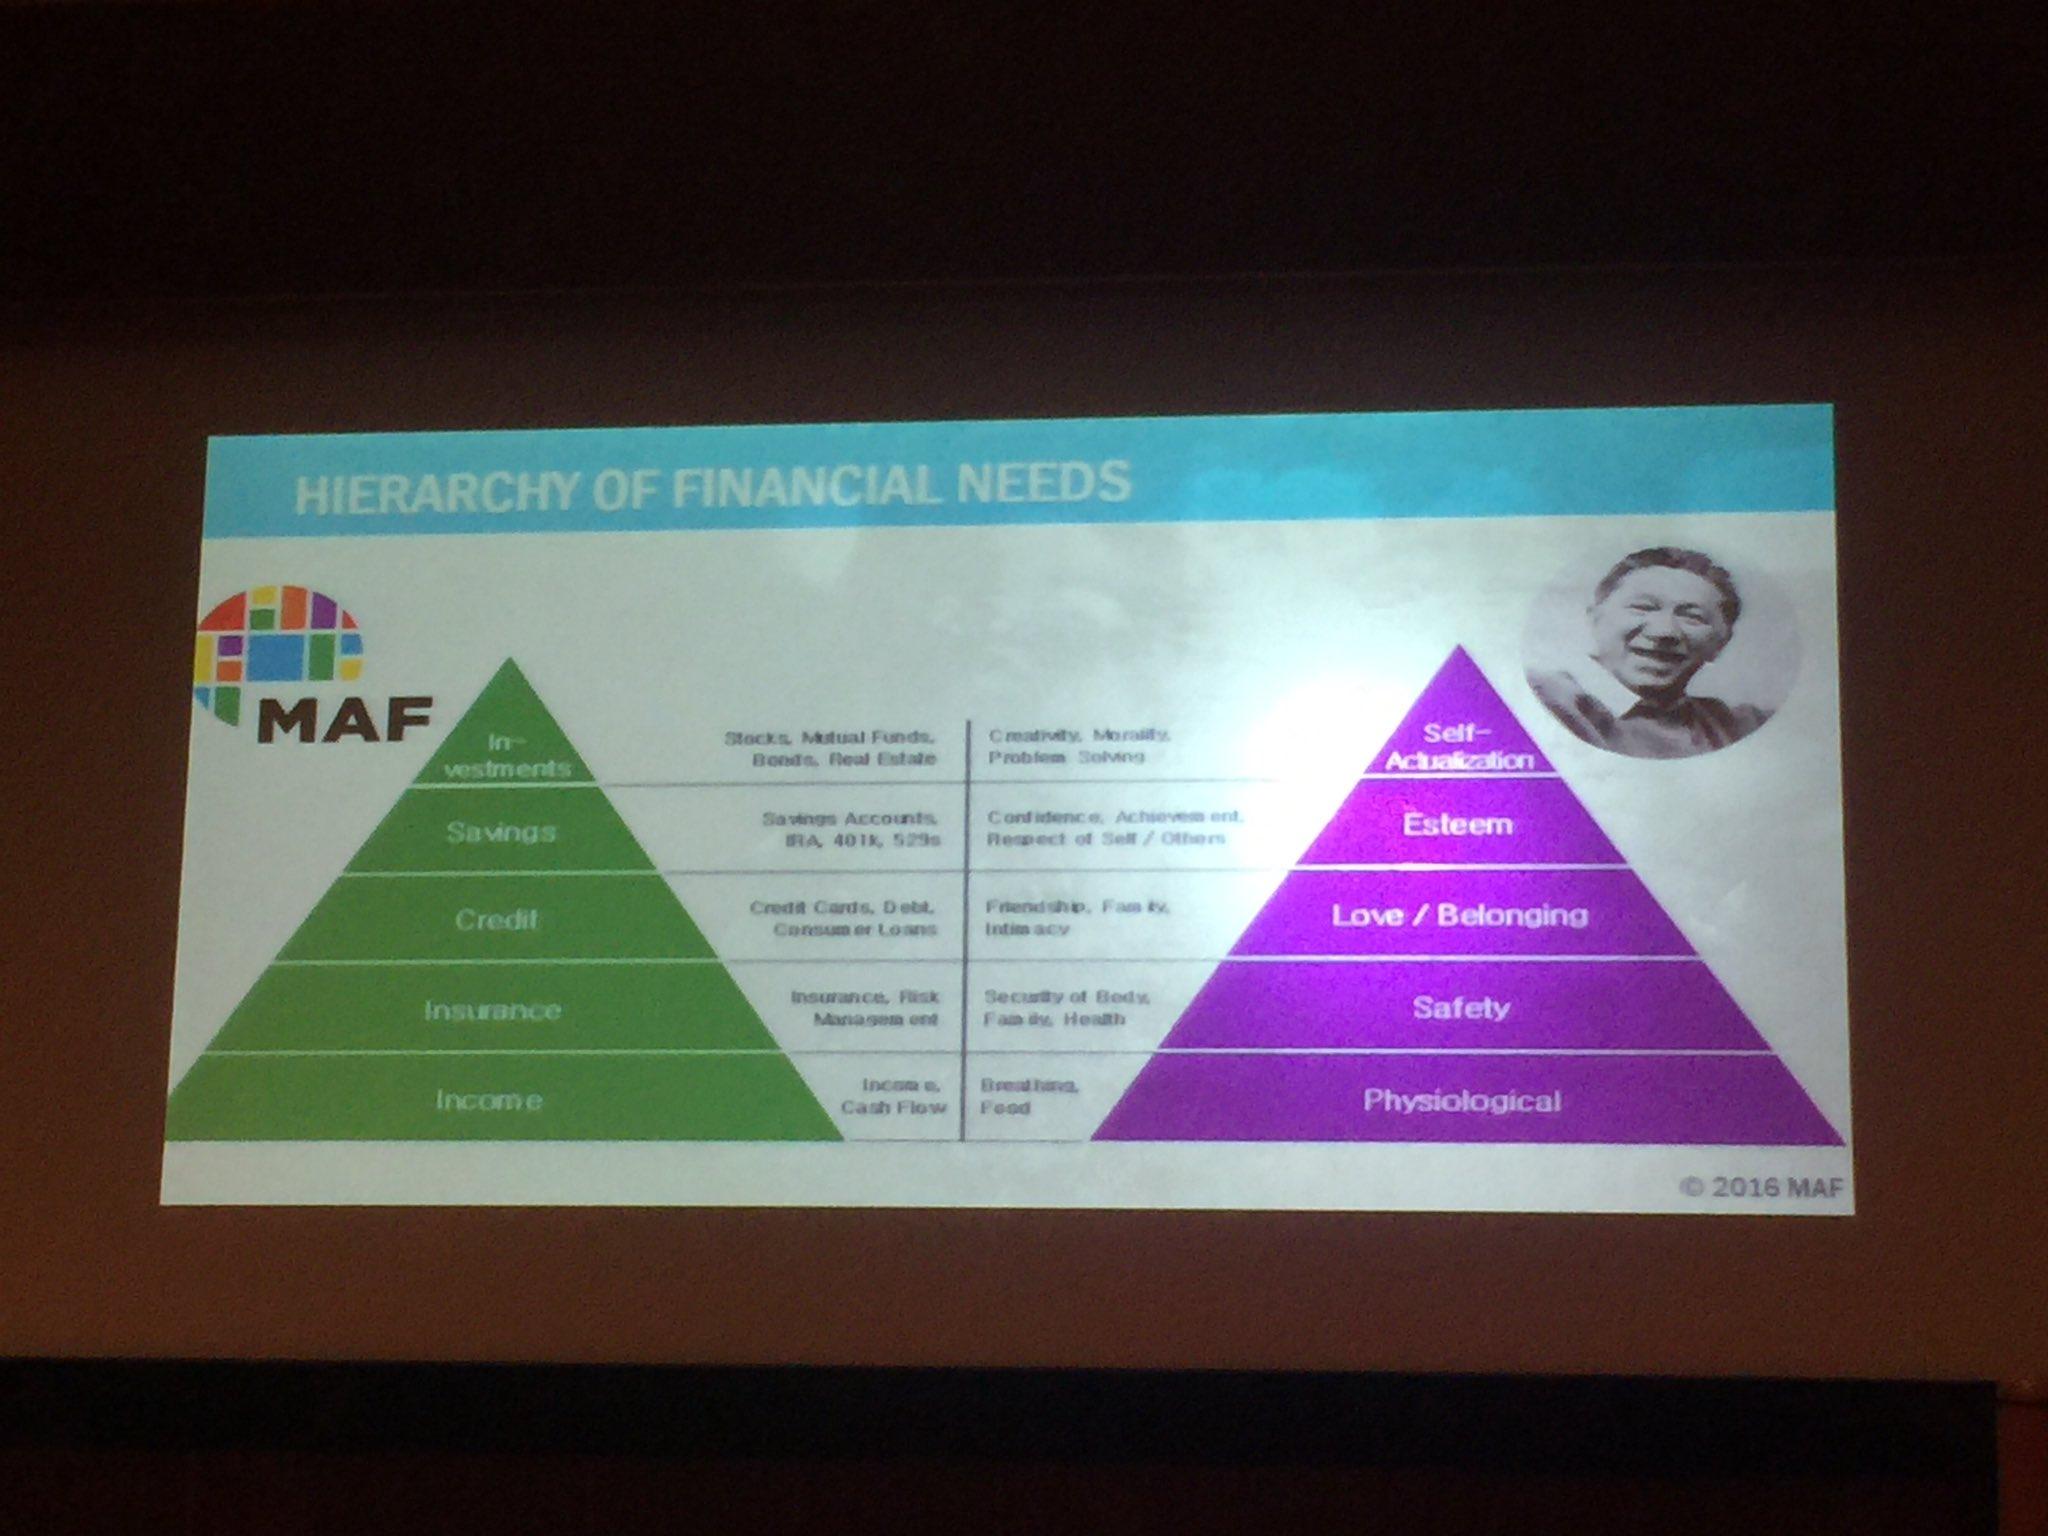 @JQ_MAF took #Maslow's hierarchy of needs & modified it as a hierarchy of financial needs #AdelantePrinceton #PrincetonU @PrincetonAlumni https://t.co/vVDCZP6k6p